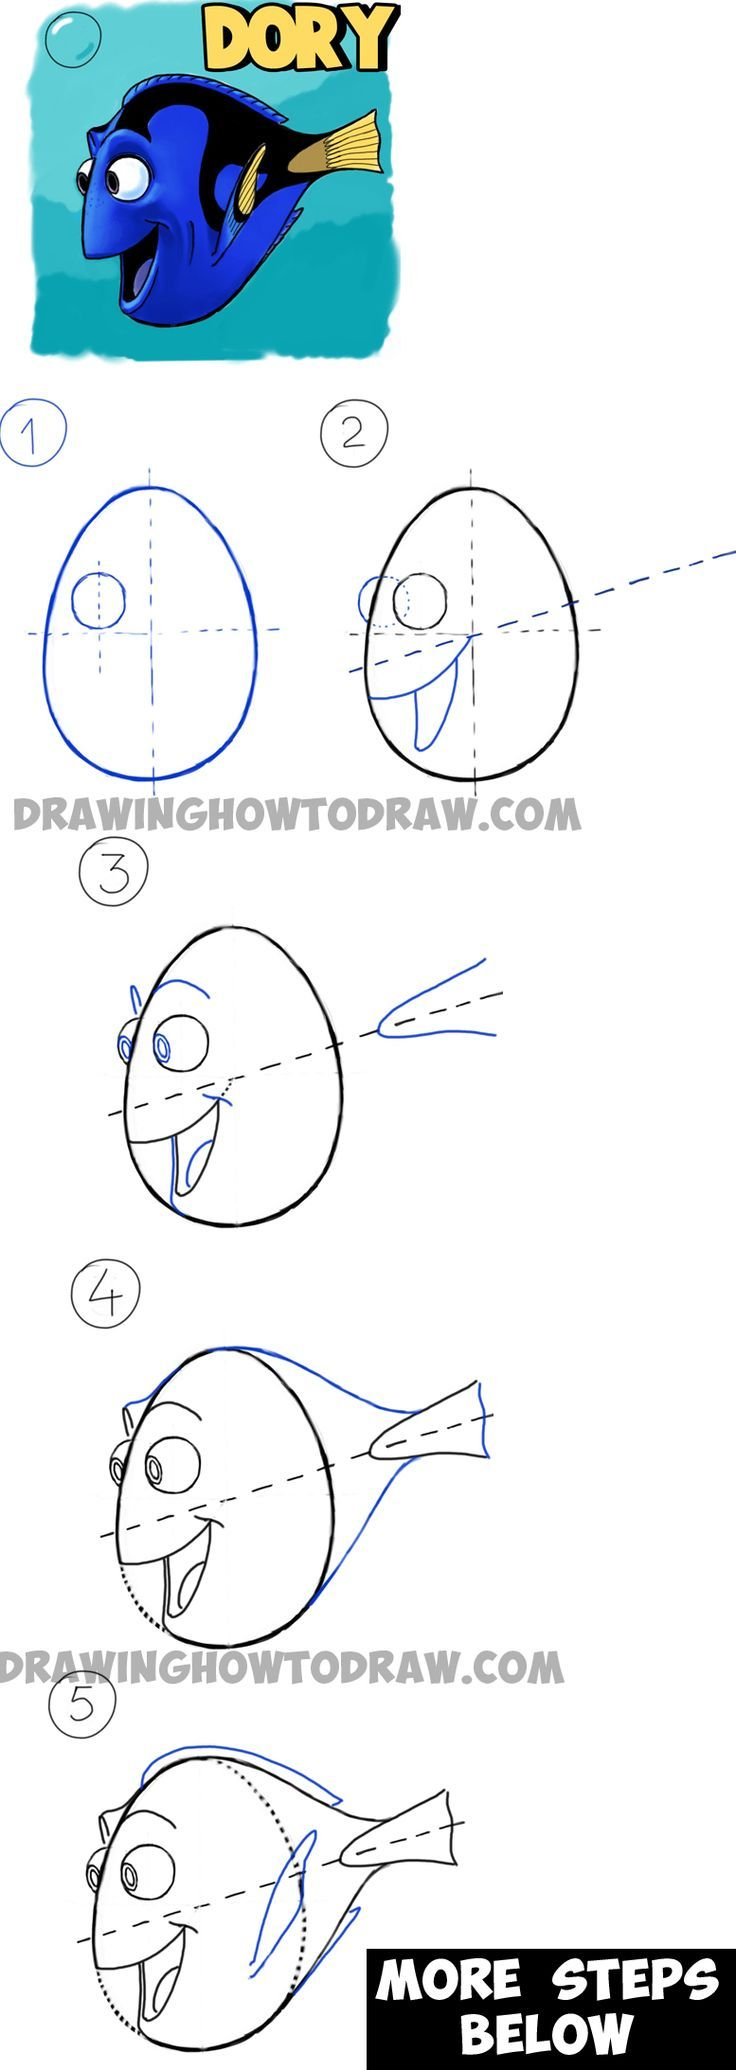 Image result for dorothy off finding nemo bible doodles